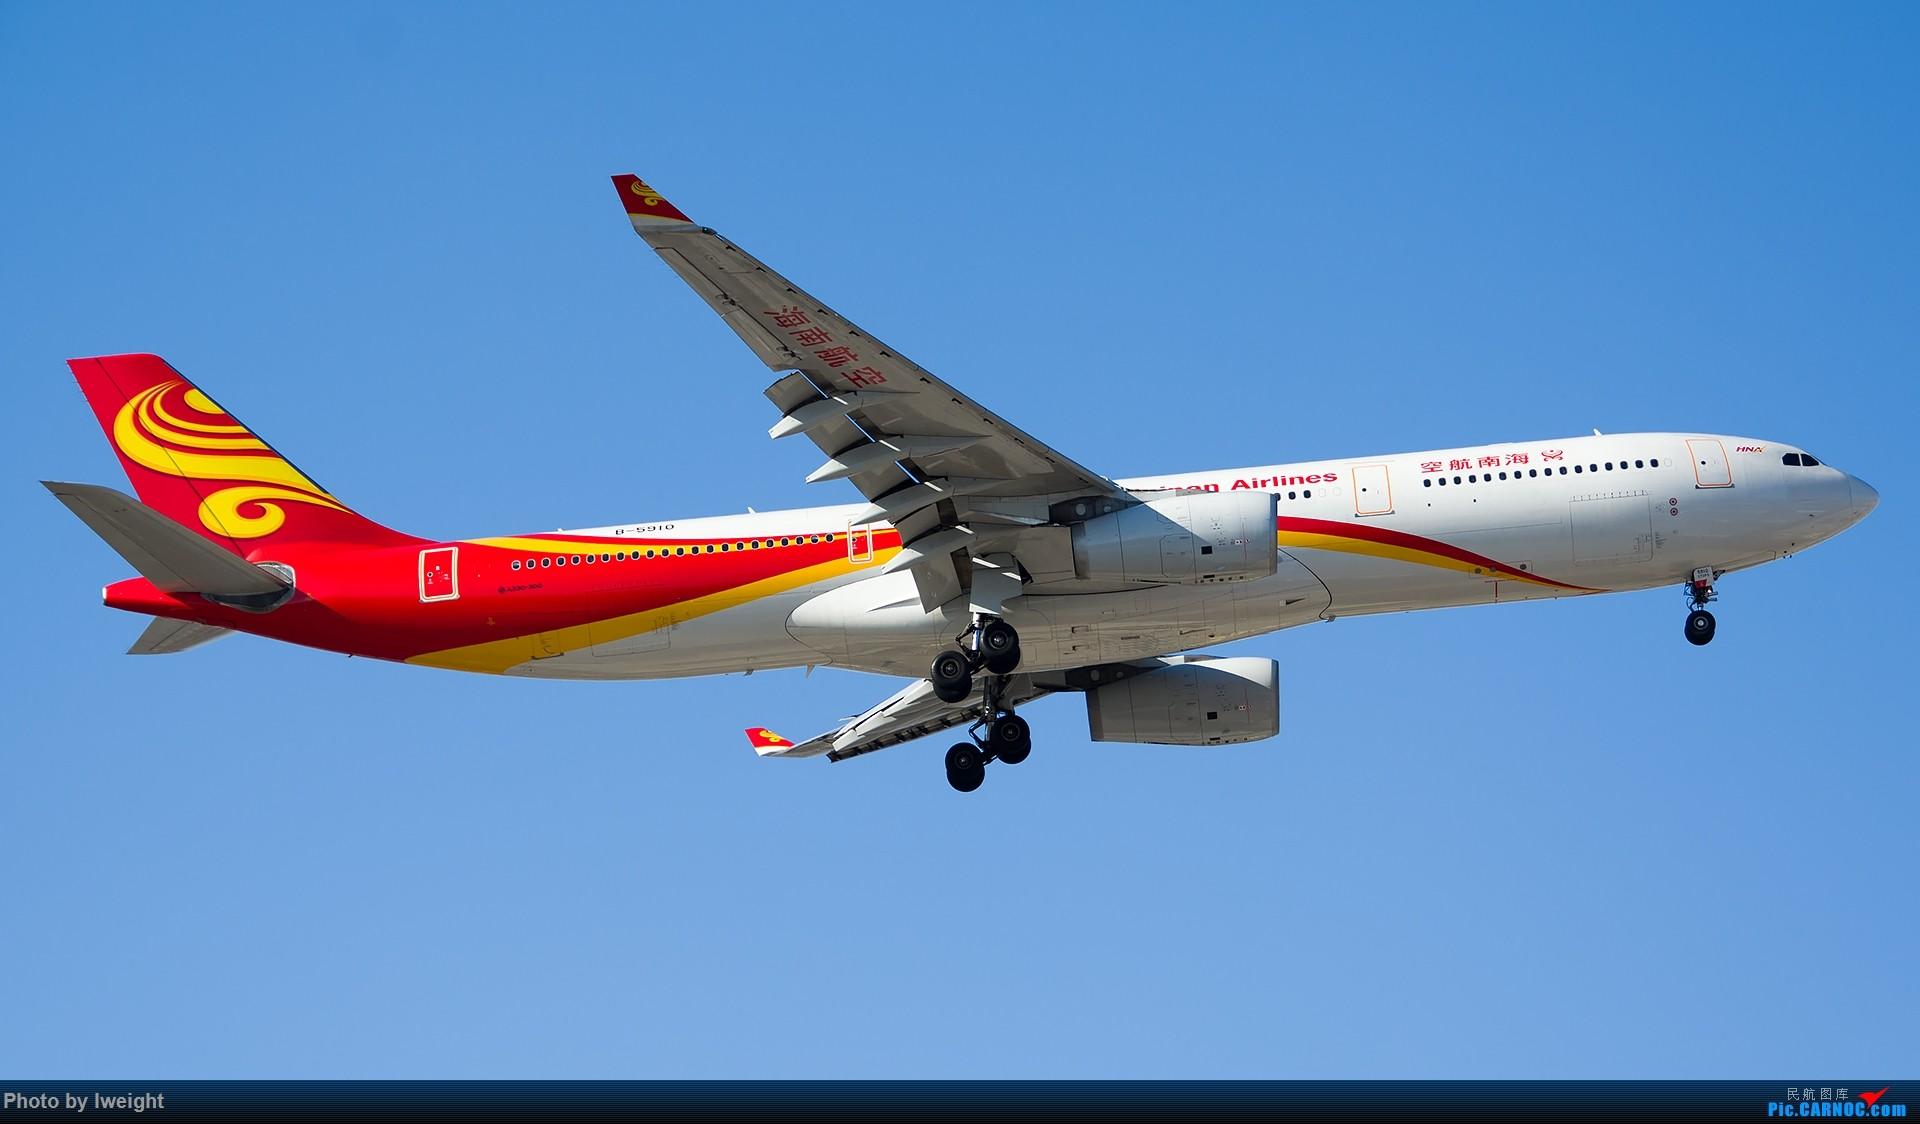 Re:[原创]北京难得的好天气,随手拍了一些渣图【2015-01-27】 AIRBUS A330-300 B-5910 中国北京首都国际机场